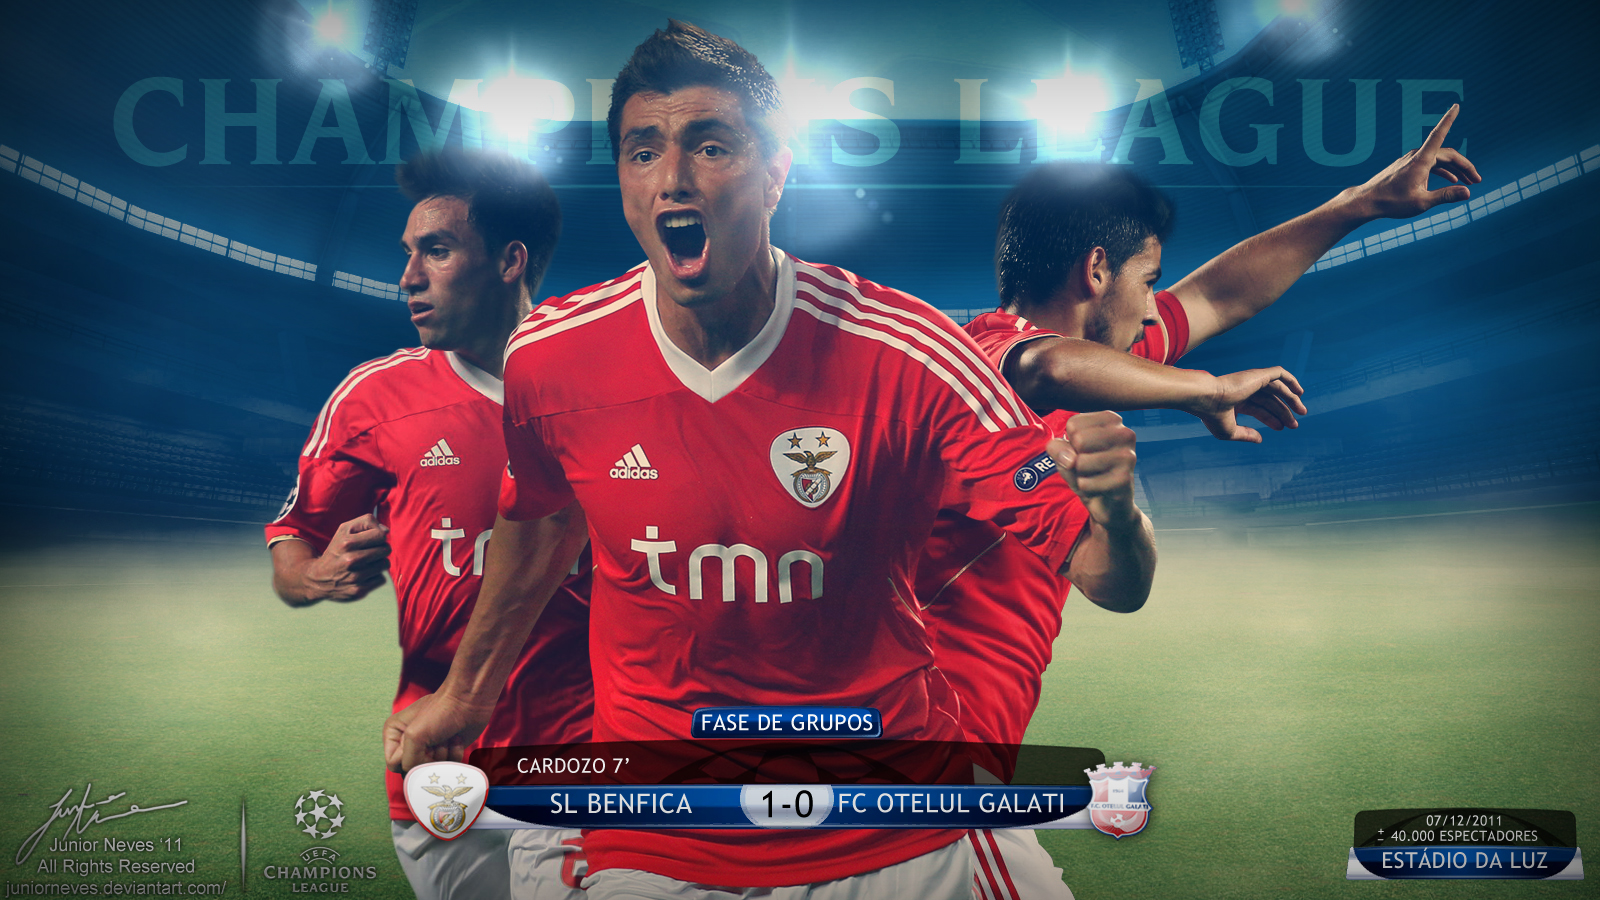 Benfica Glorioso 1904 Wallpaper Benfica Champions League 20112012 1600x900